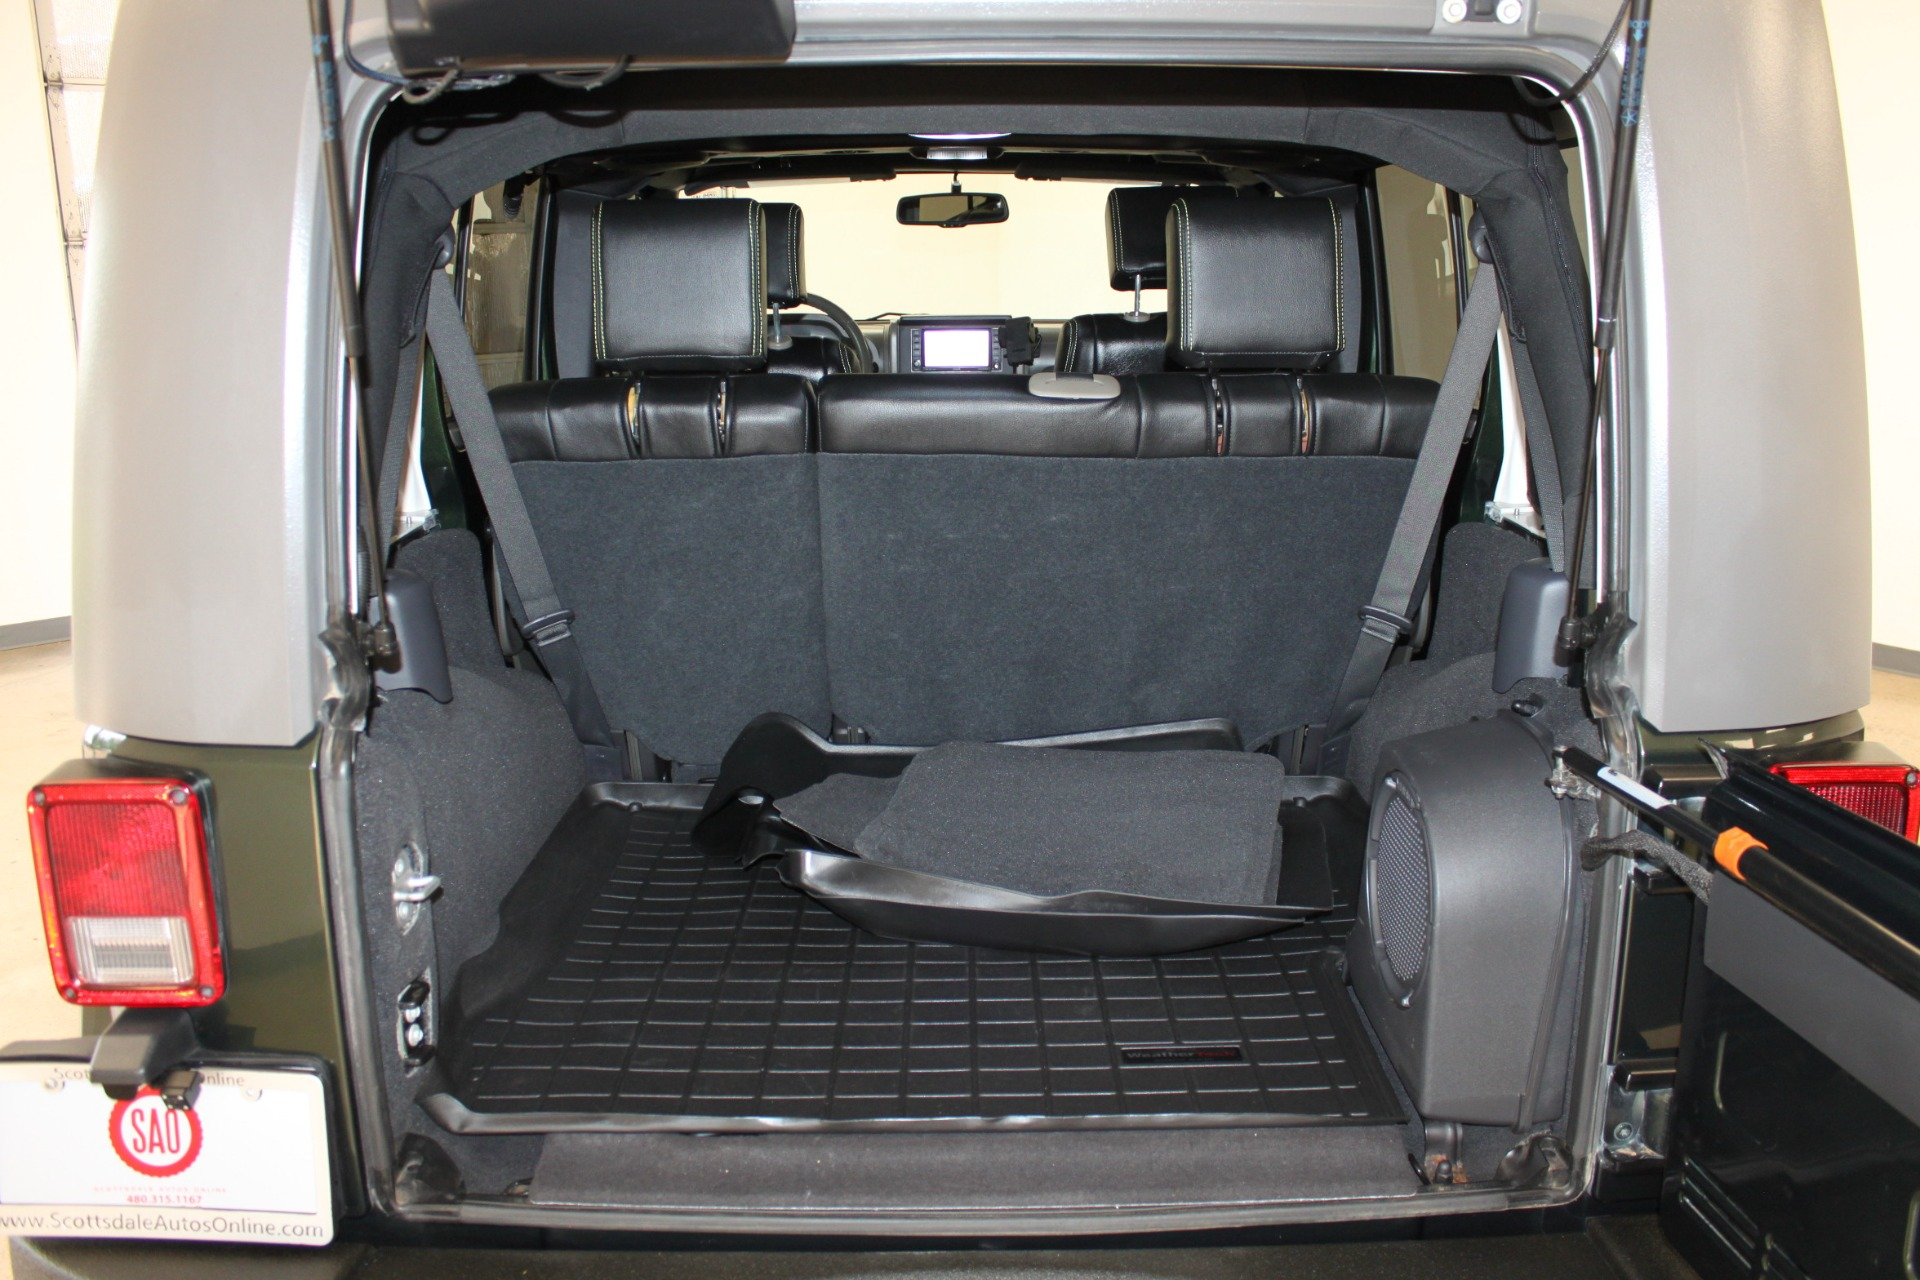 Used-2010-Jeep-Wrangler-Unlimited-Sahara-4X4-Chevrolet